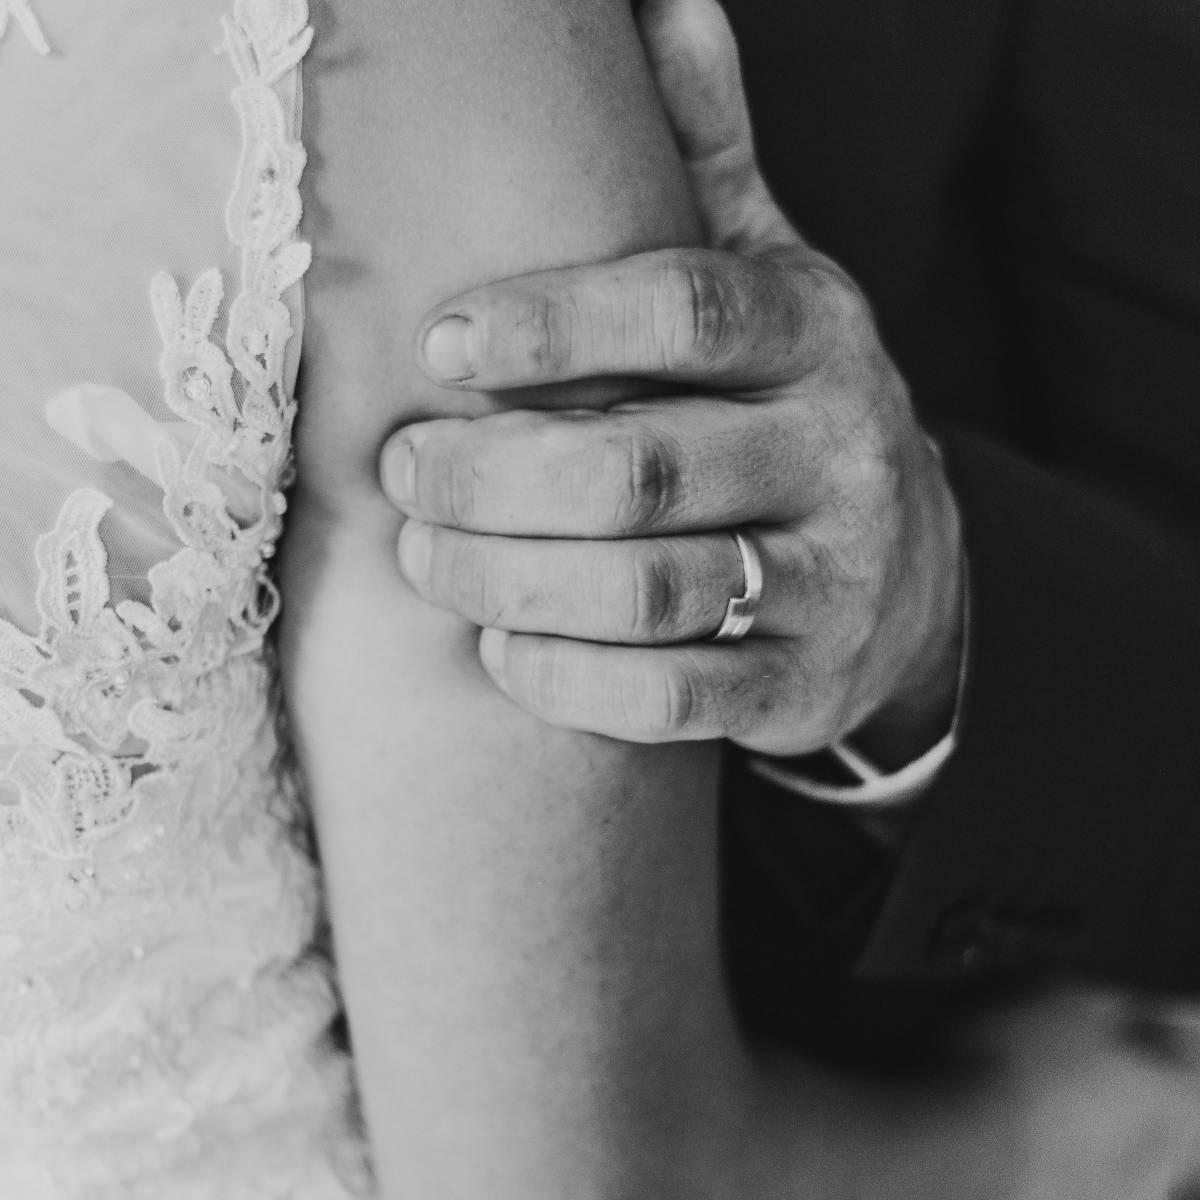 MMAAK - Bruidsjuwelen - Fotograaf Hanne Kelchtermans - House of Weddings 3